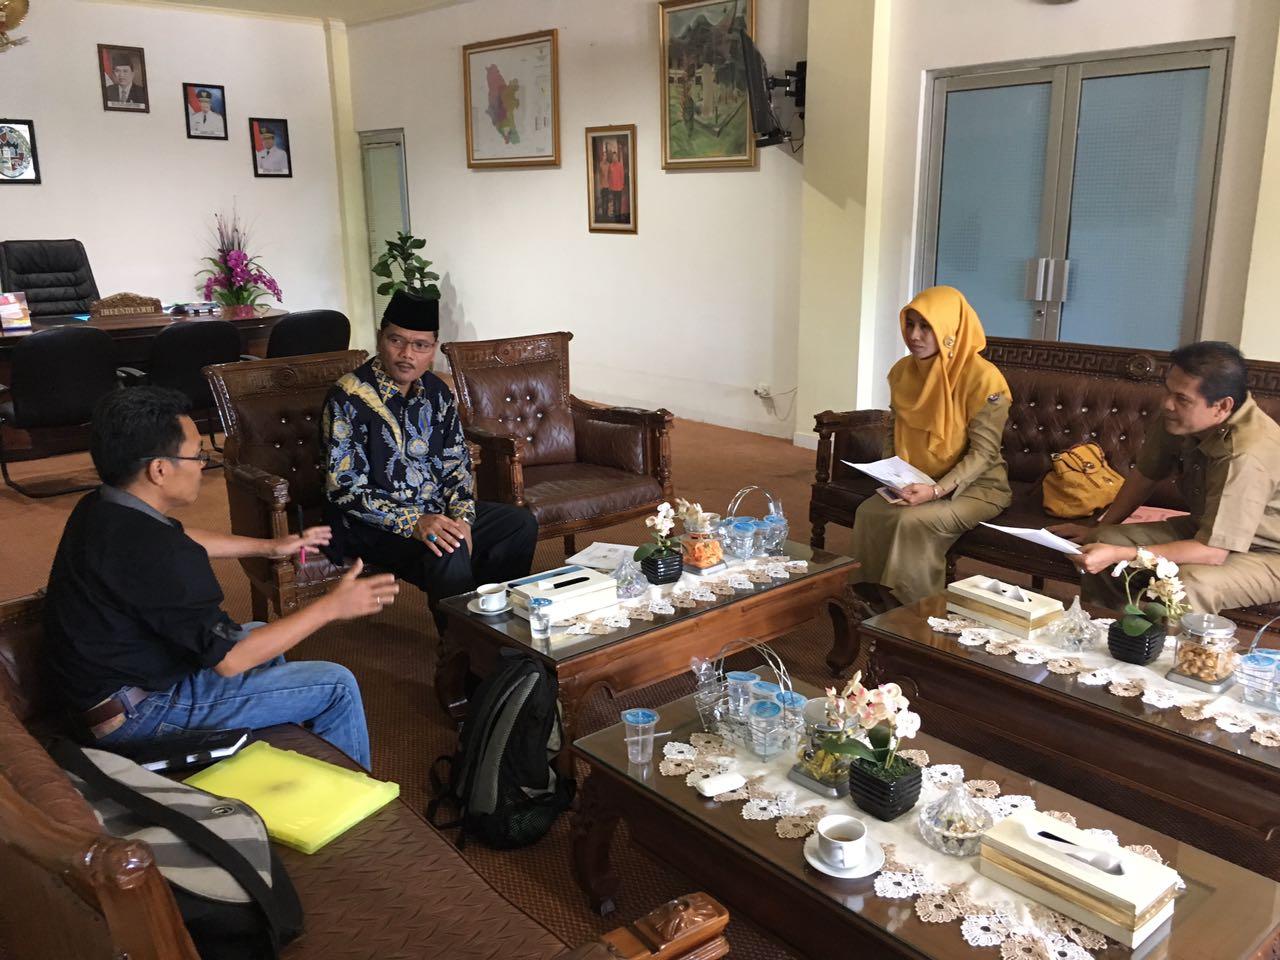 Bupati Irfendi Arbi saat berdiskusi dengan tim bhakti sosial Mapala Unand di ruang kerjanya, Selasa (25/10).